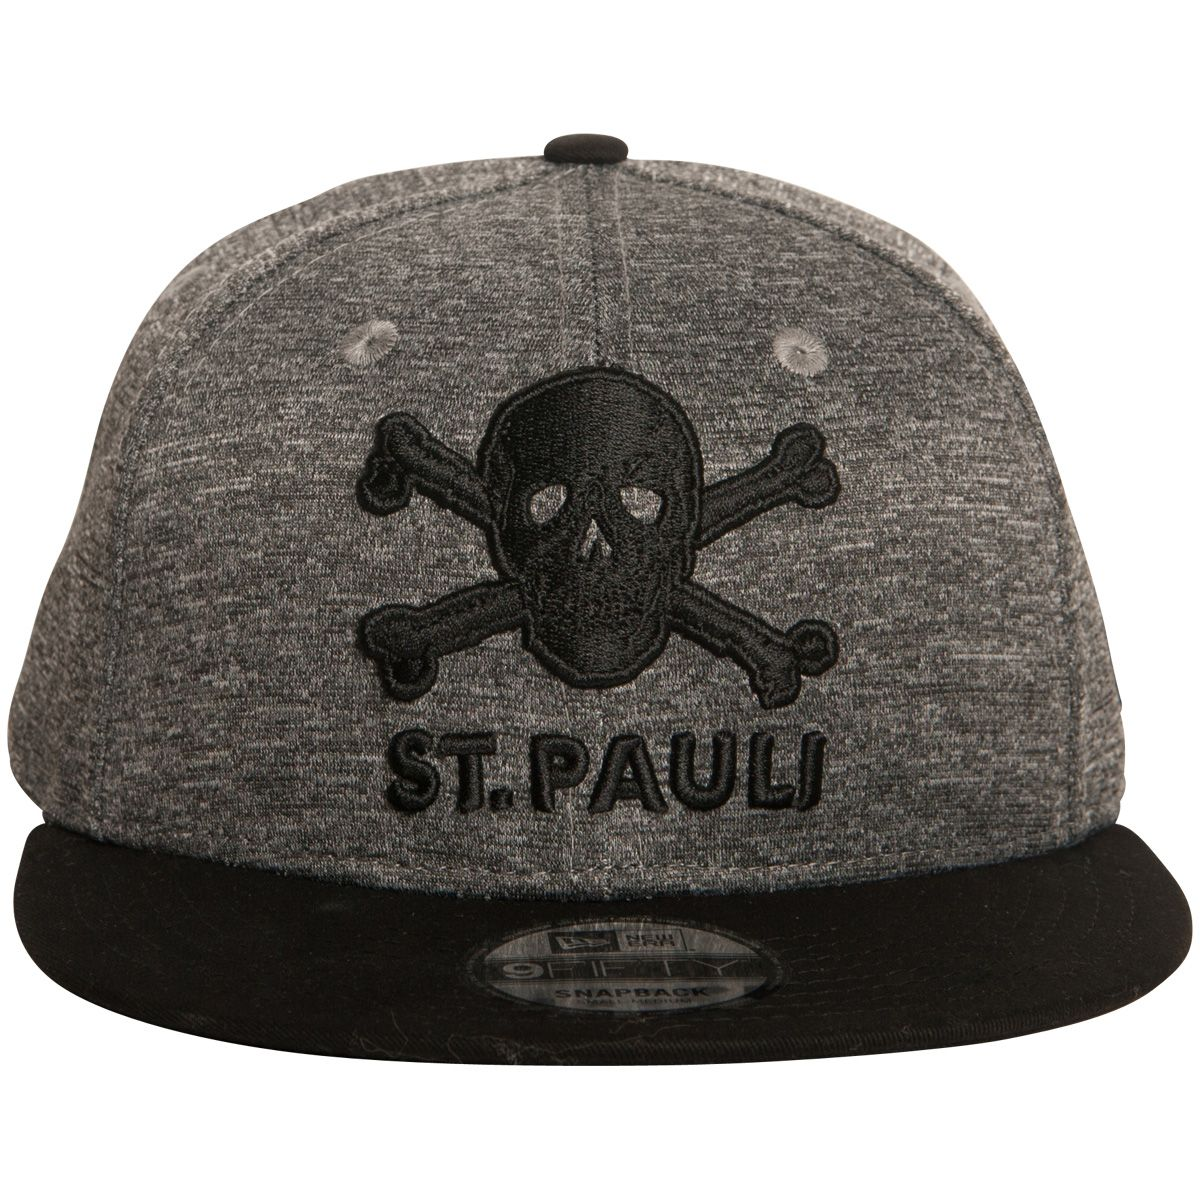 FC St. Pauli - Kappe 9fifty Snapback Totenkopf - grau-schwarz